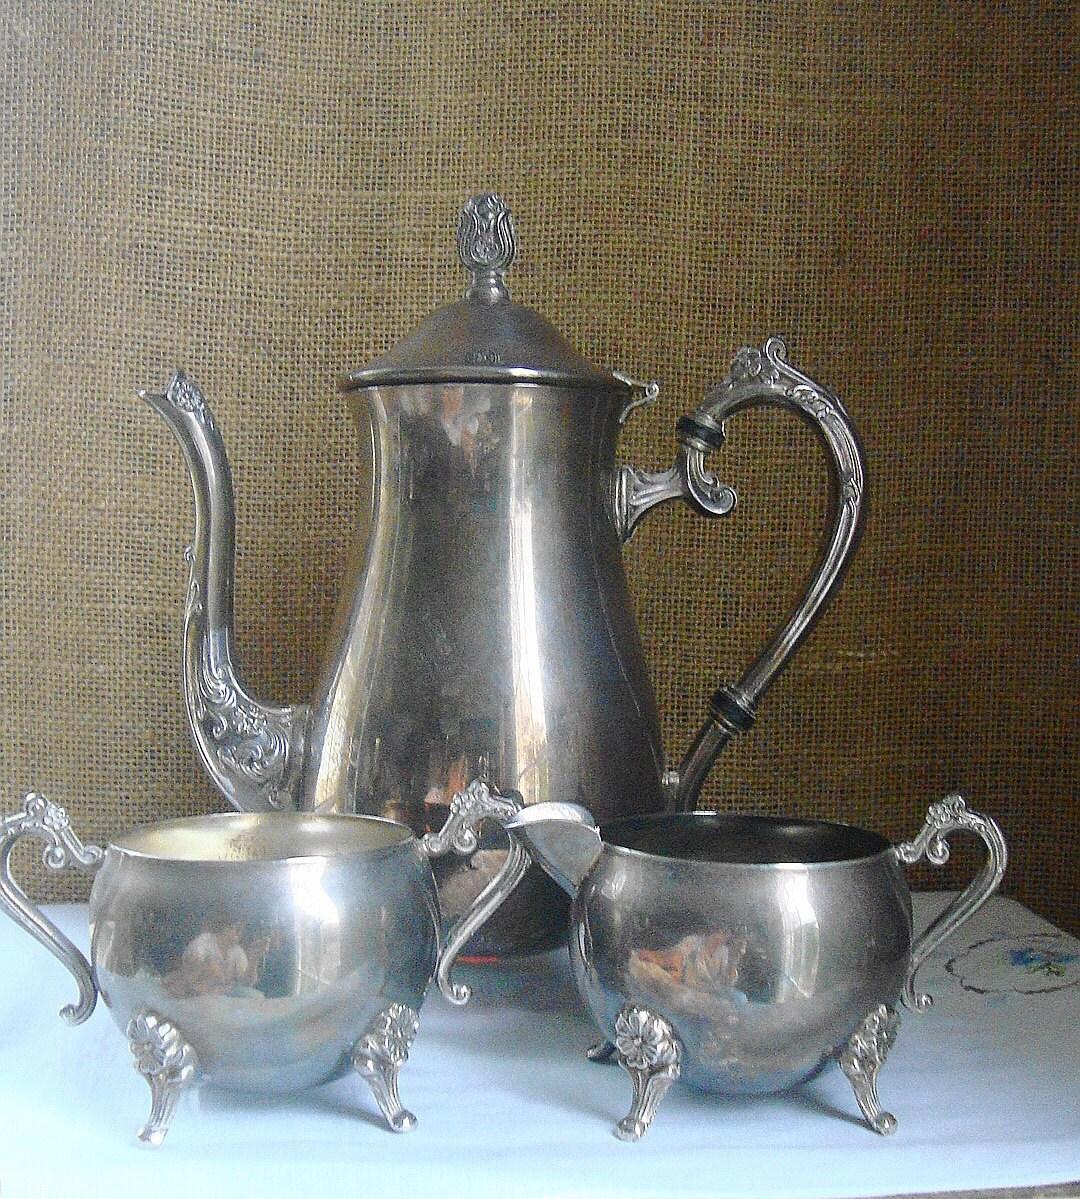 vintage victorian elegance silverware coffee tea service with